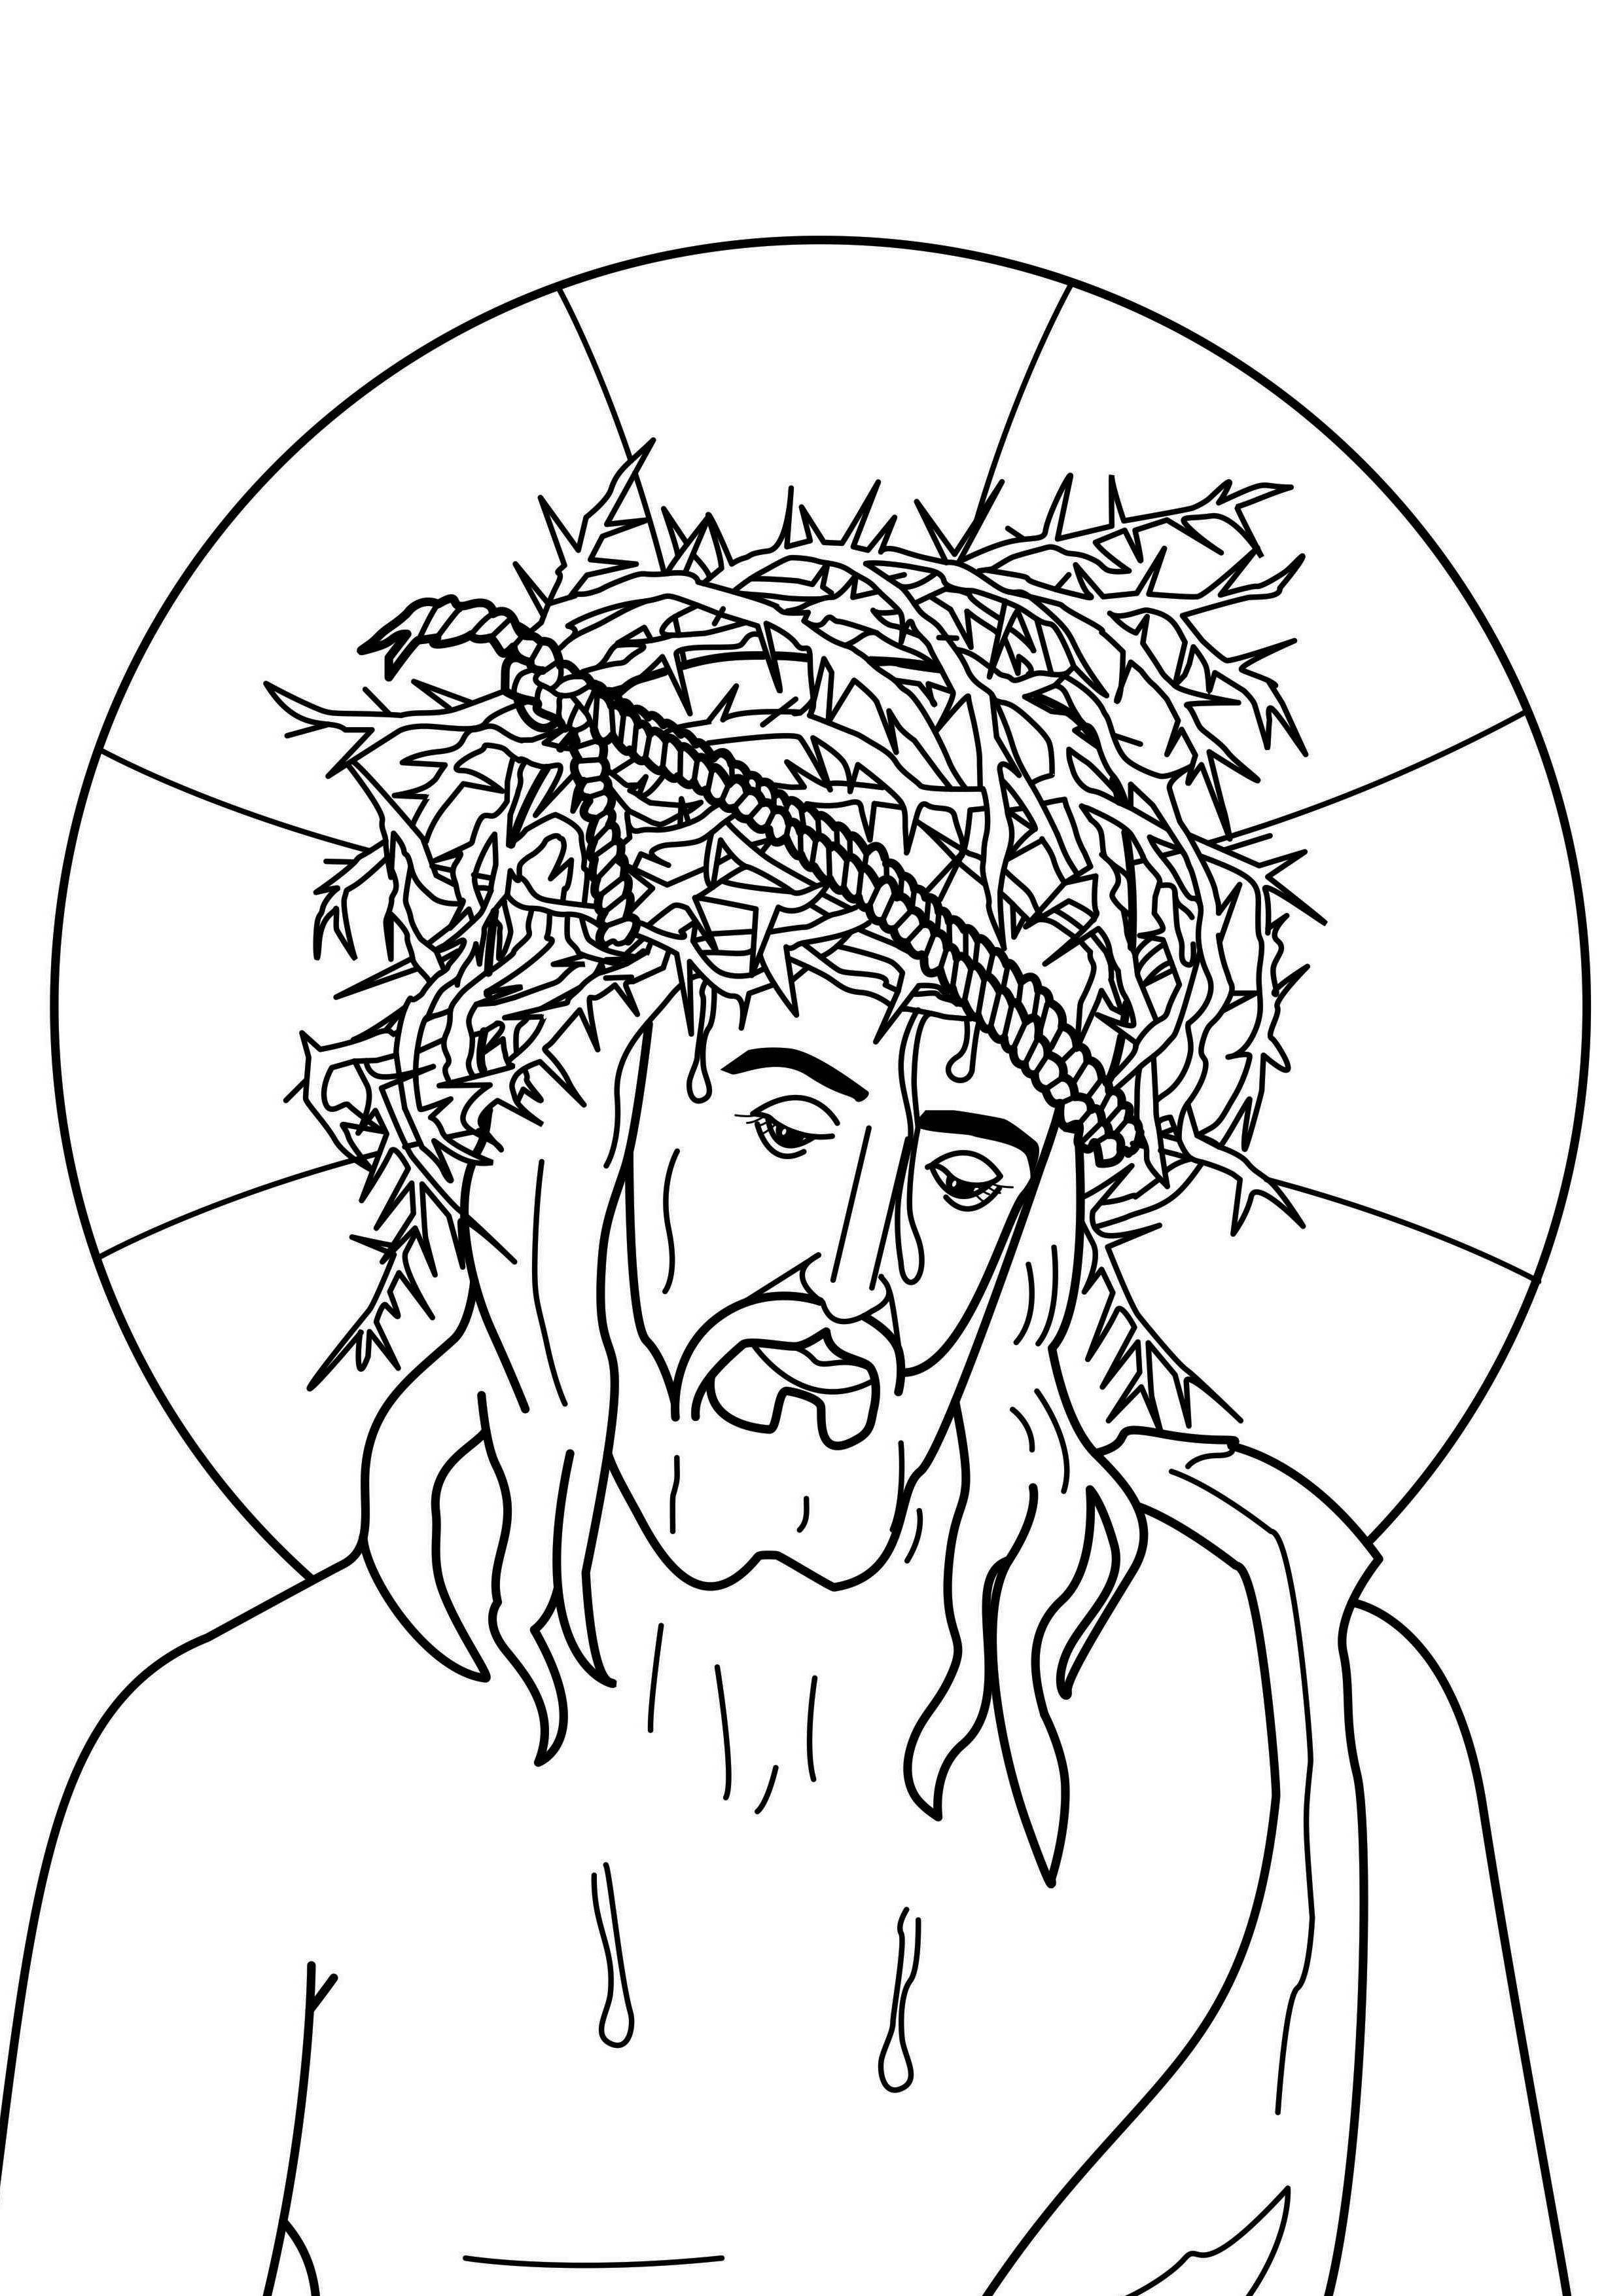 Passion Of The Christ موسوعة صور الكتاب المقدس للتلوين صفحات